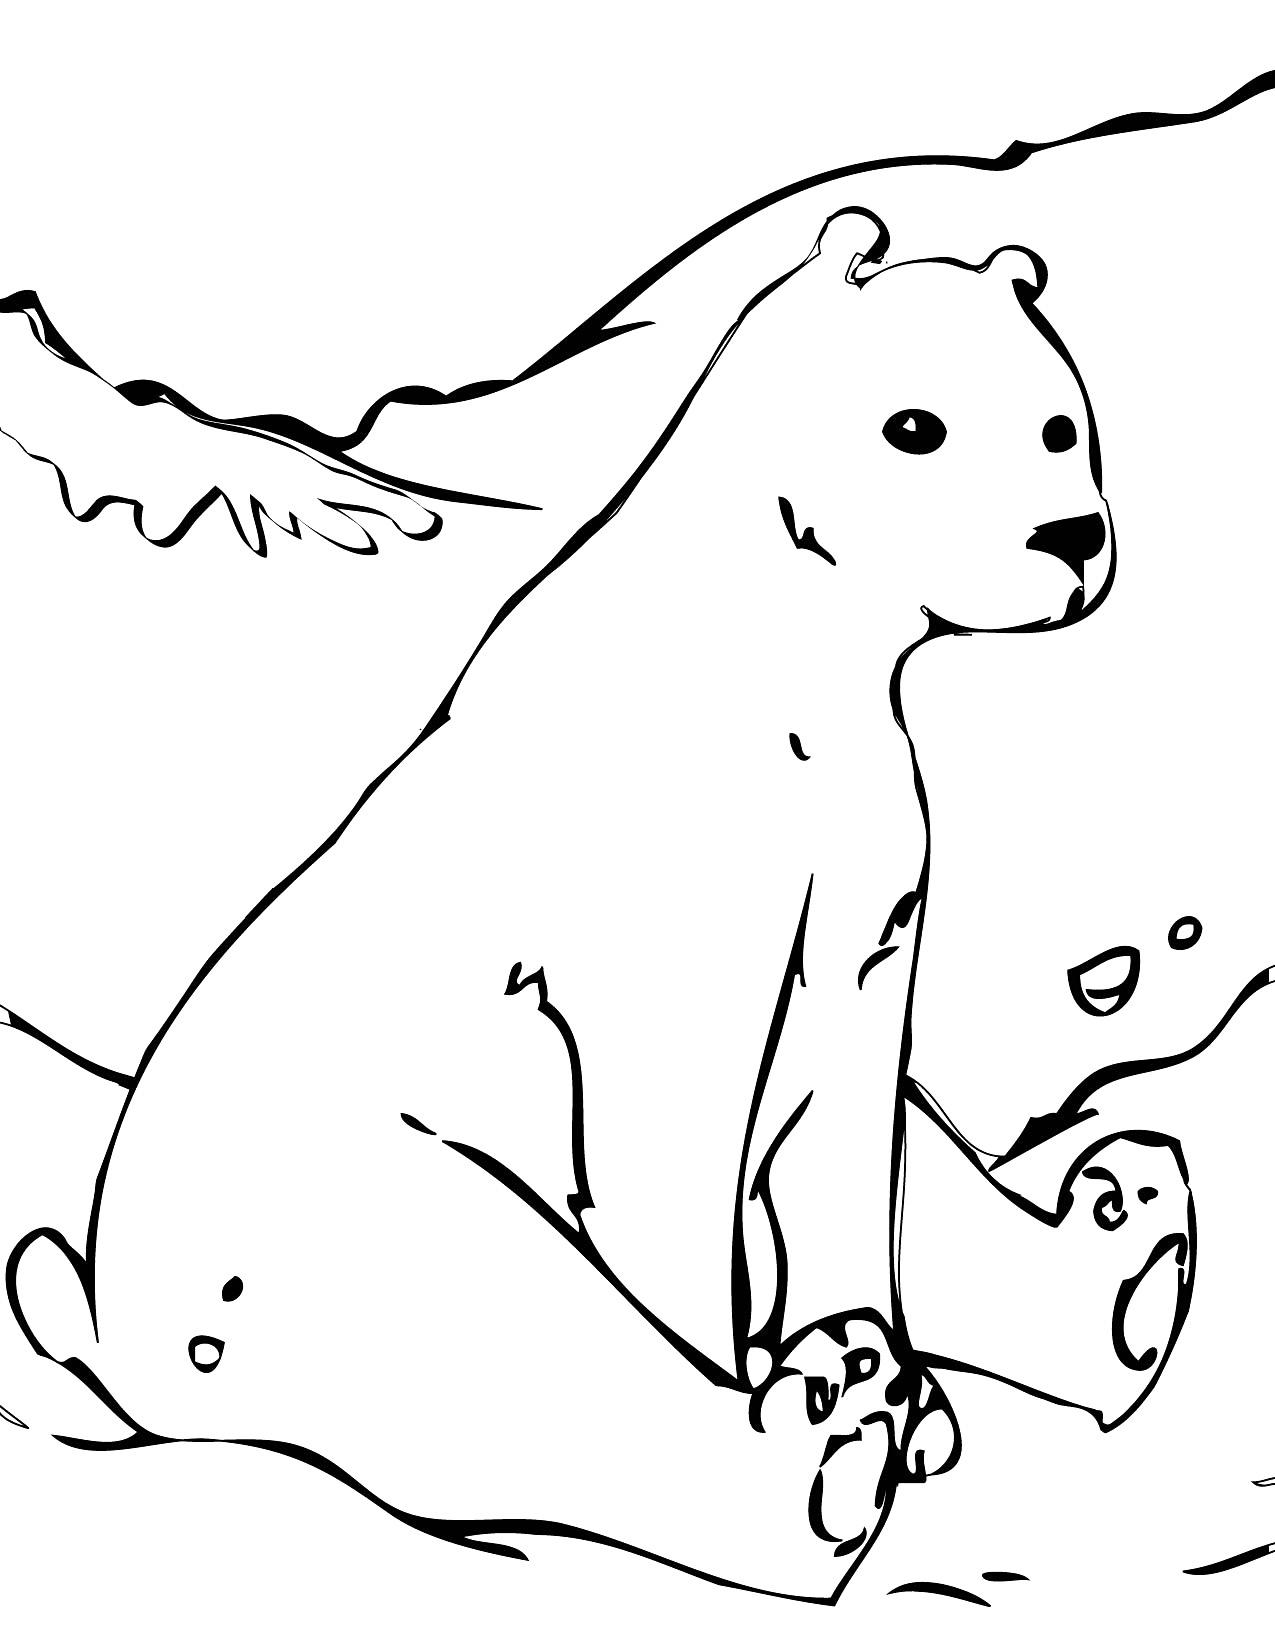 Drawn polar  bear printable Kids Bear Printable Dogjpg A